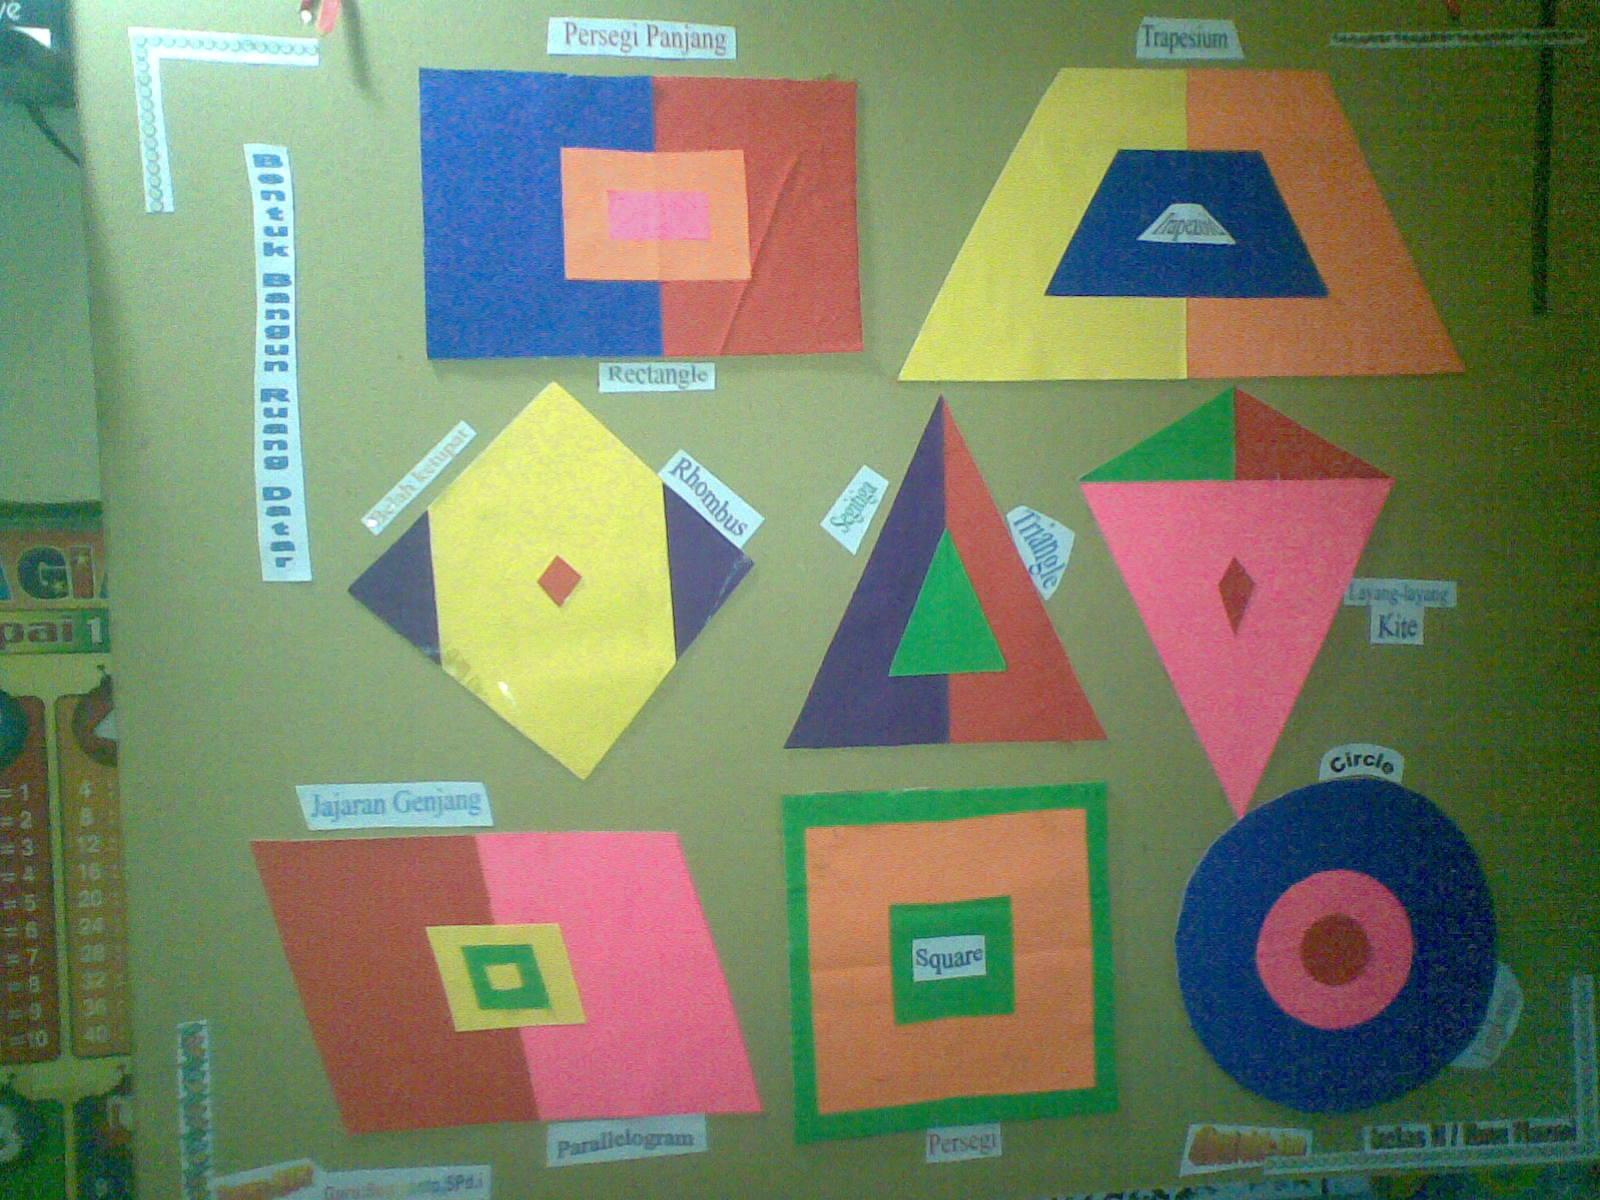 Soal Latihan Bangun Ruang Sd Latihan Soal Matematika Kelas 1 Sd Semester 1 Buat Belajar Anak